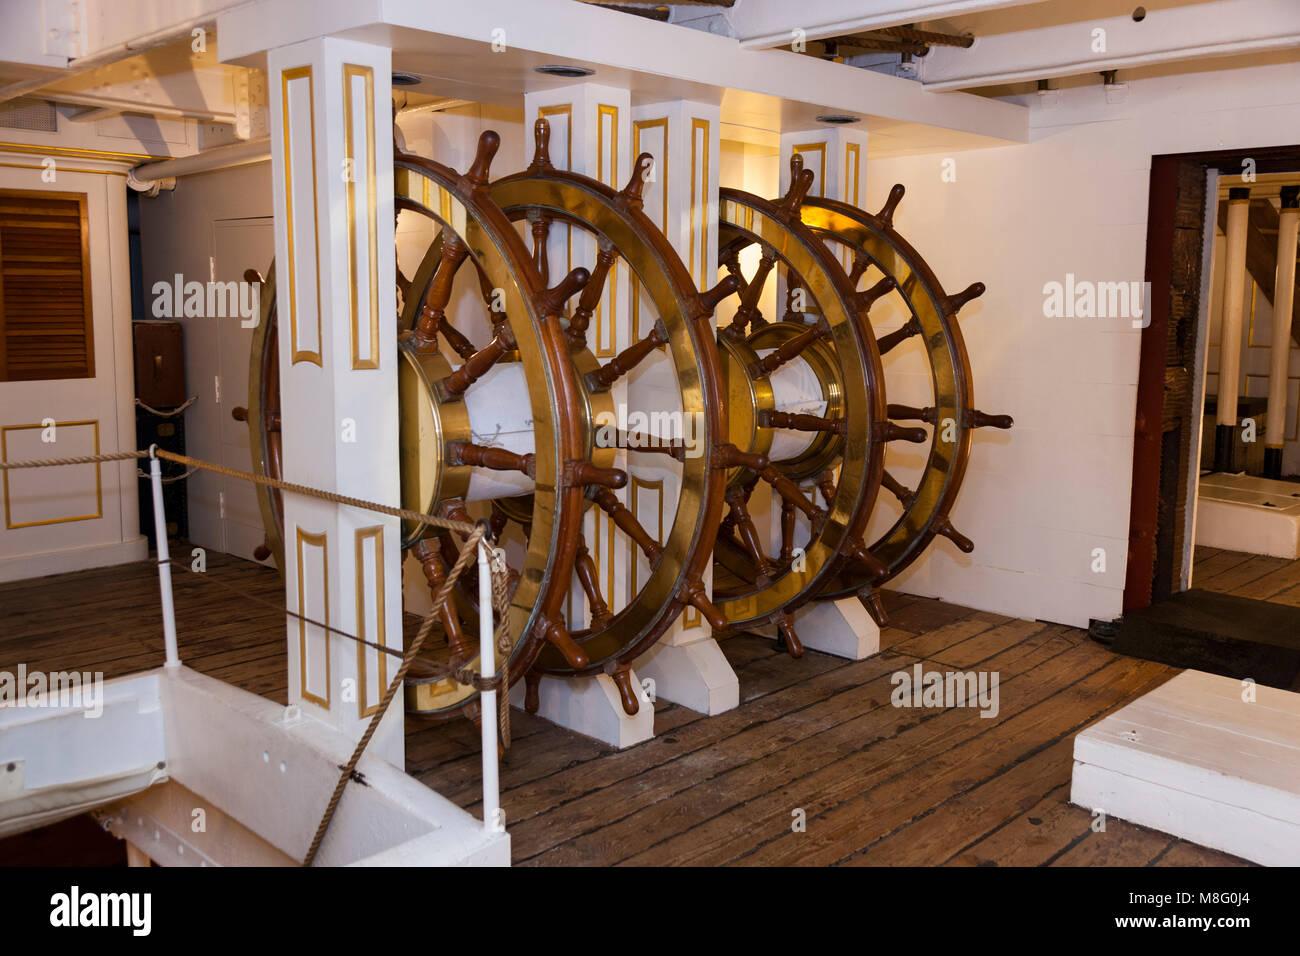 Ships wheels / steering position / lower deck / helm HMS Warrior. Portsmouth Historic Dockyard / Dockyards. UK. Stock Photo